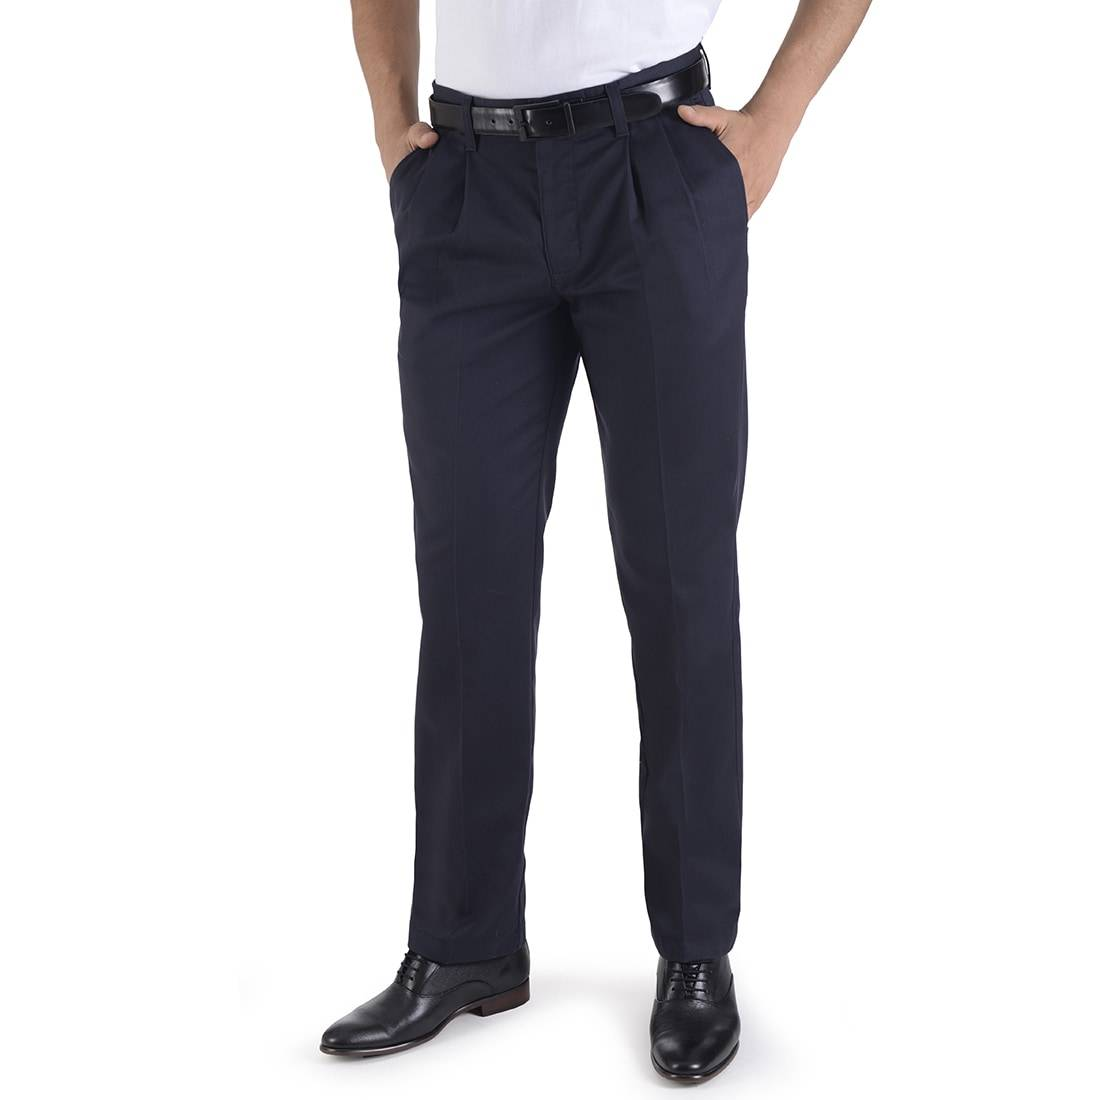 010816072619-01-Pantalon-Casual-Classic-Fit-Con-Pinzas-Repelente-a-Manchas-Marino-yale